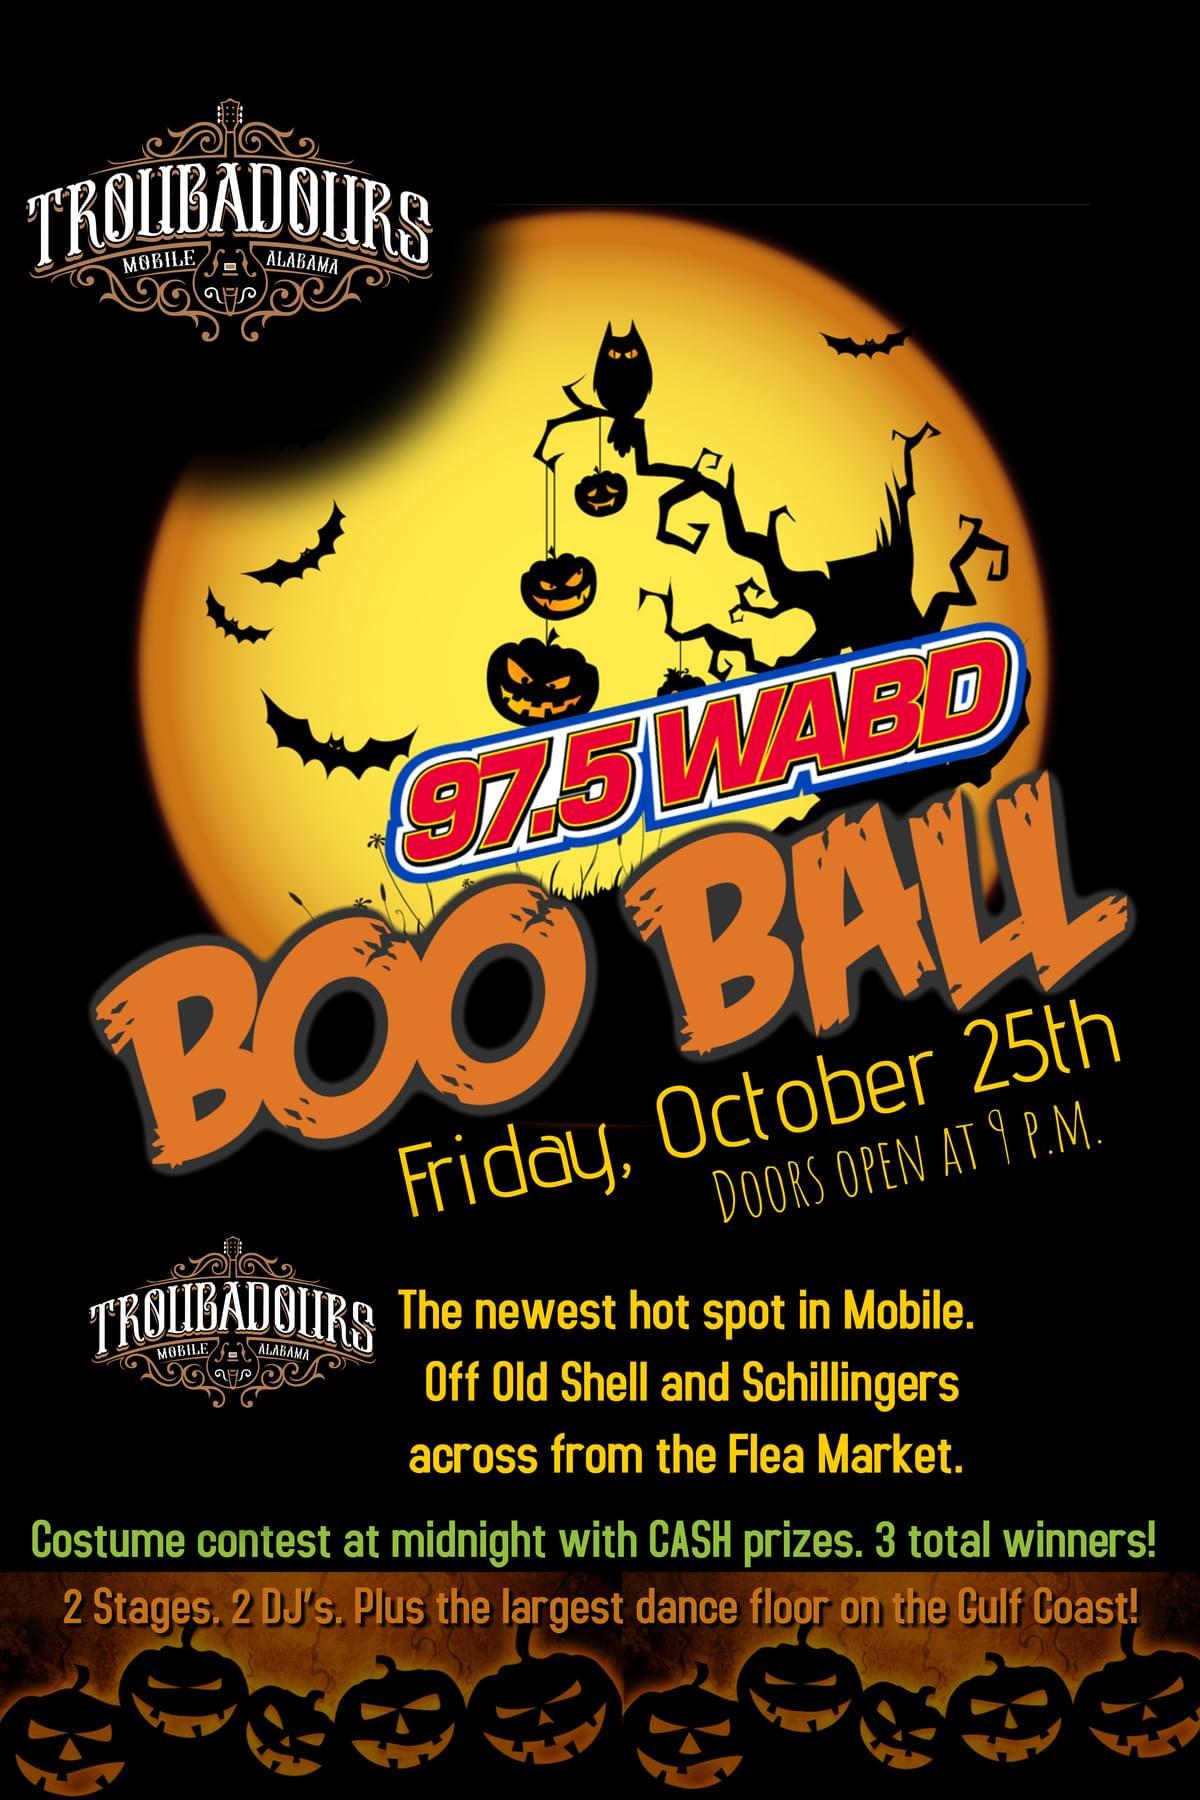 WABD's BOO BALL!